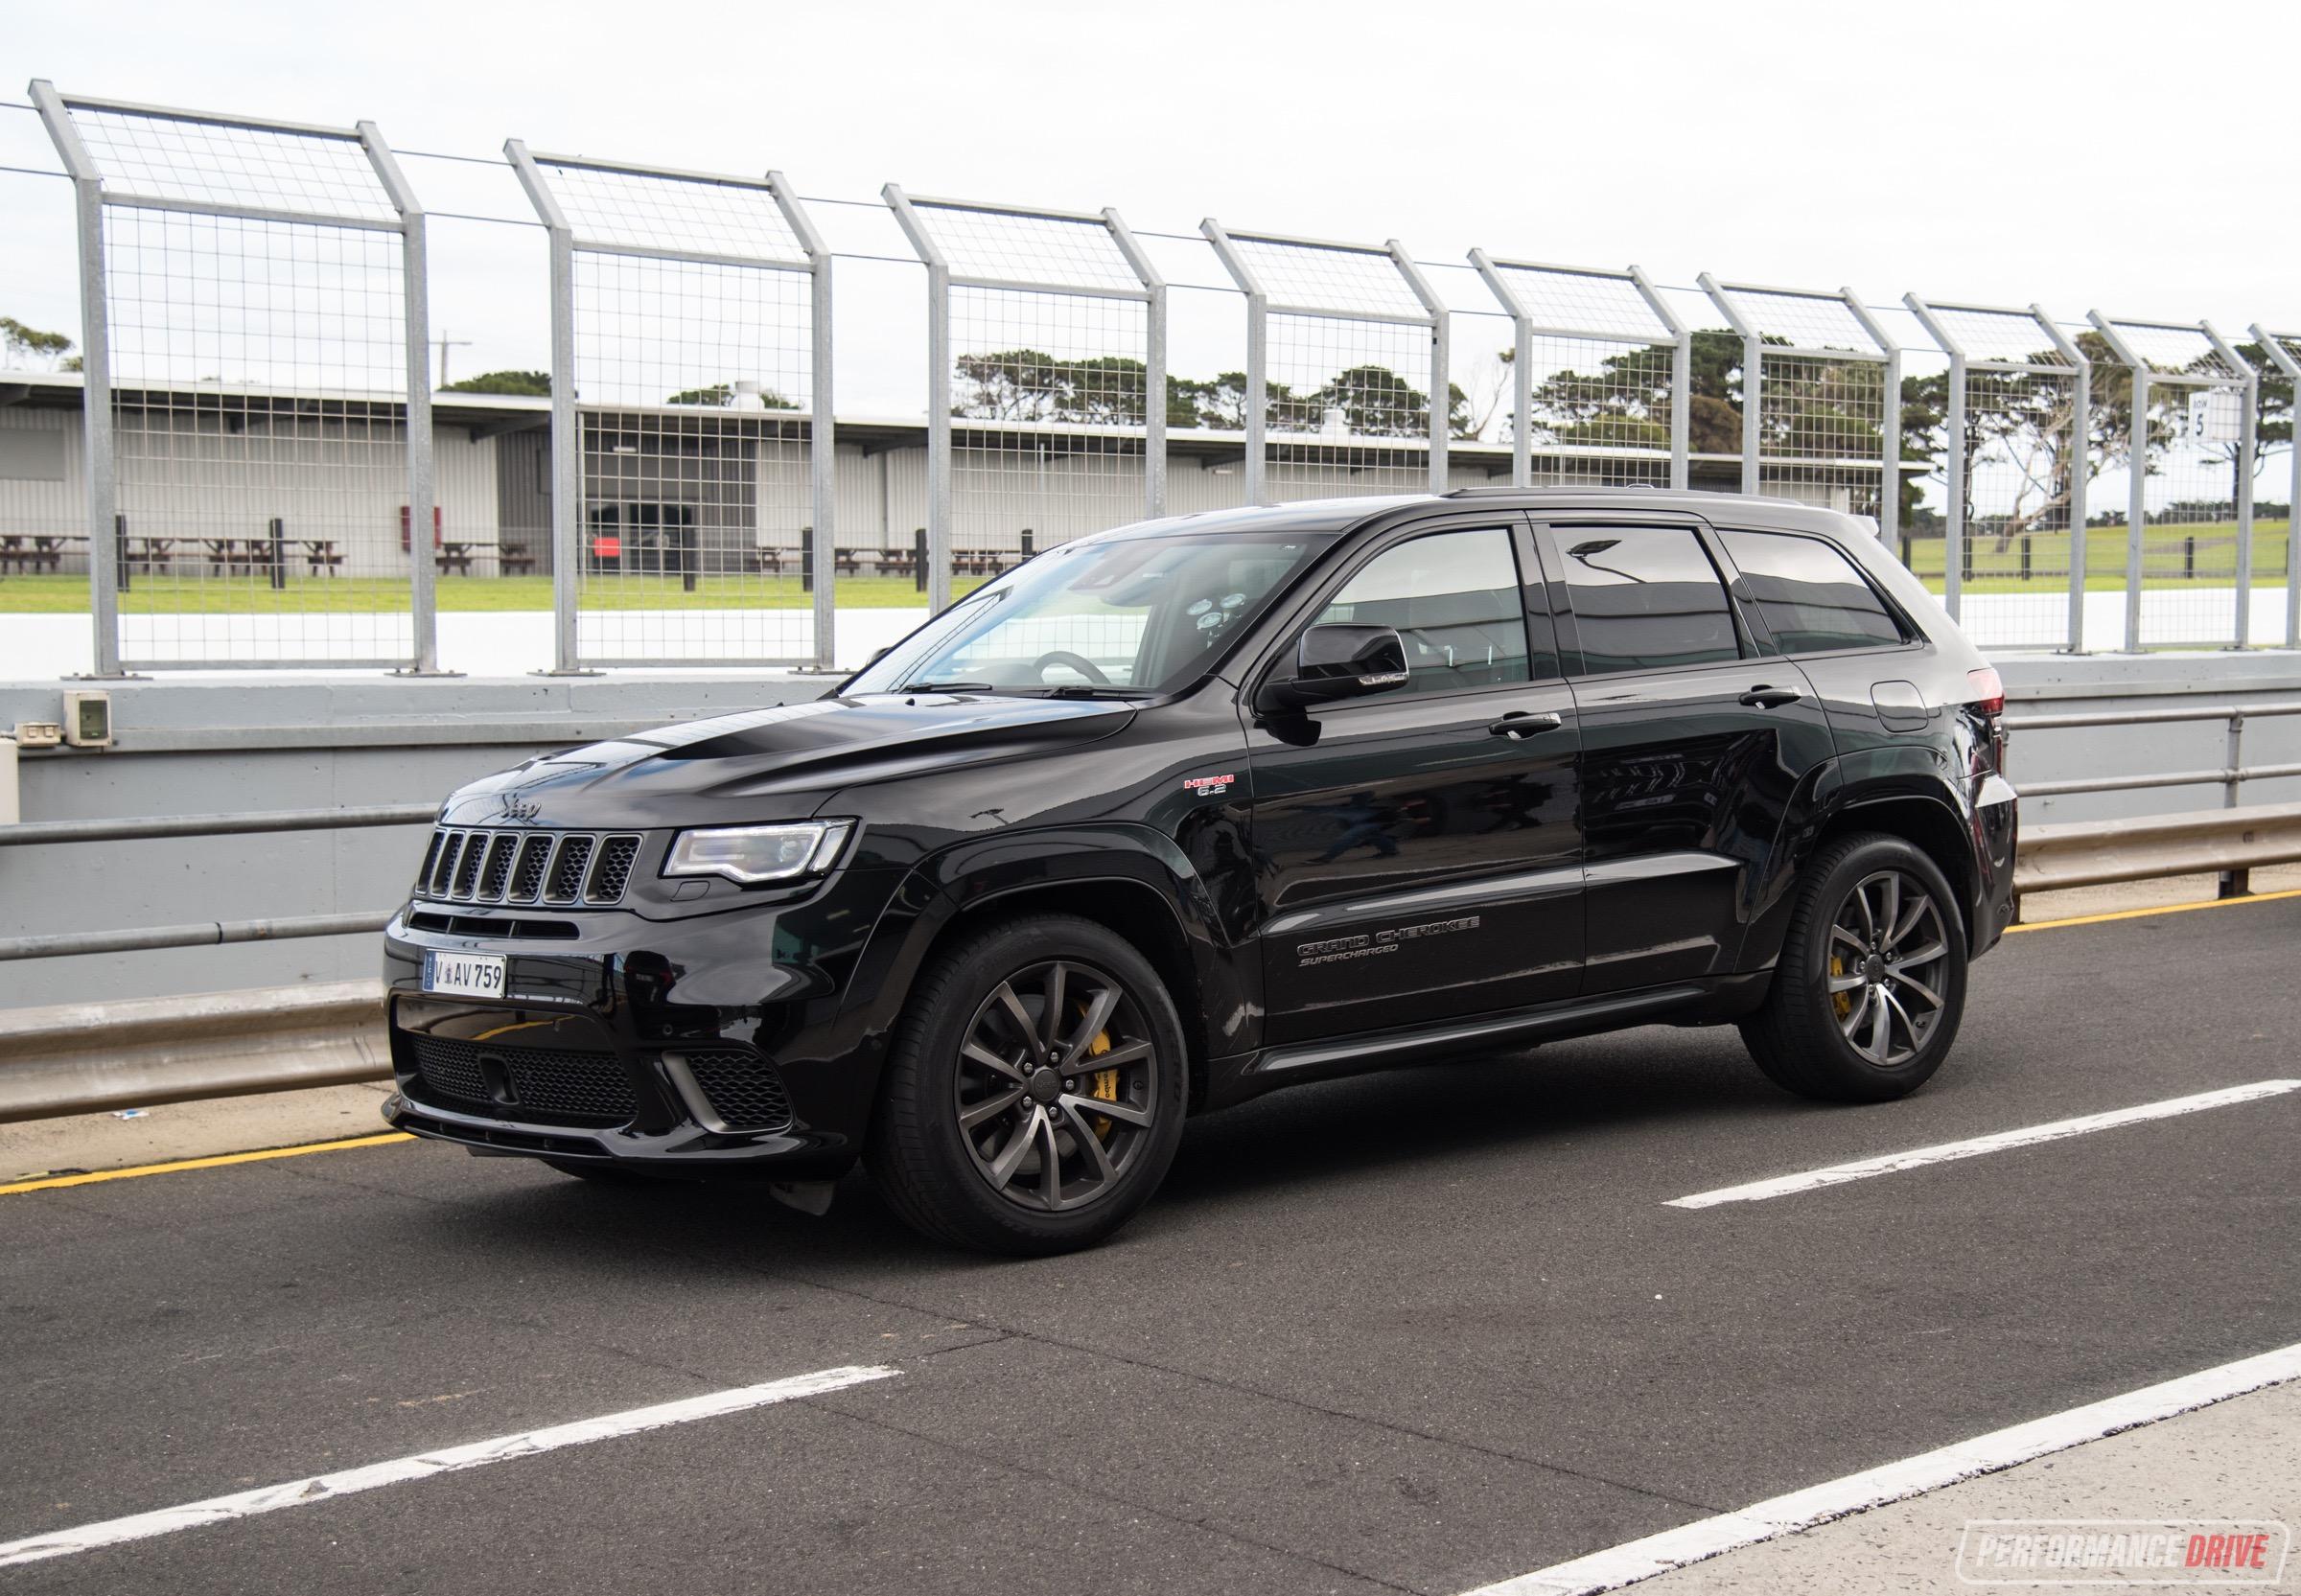 2018 jeep grand cherokee trackhawk review australian launch video performancedrive. Black Bedroom Furniture Sets. Home Design Ideas